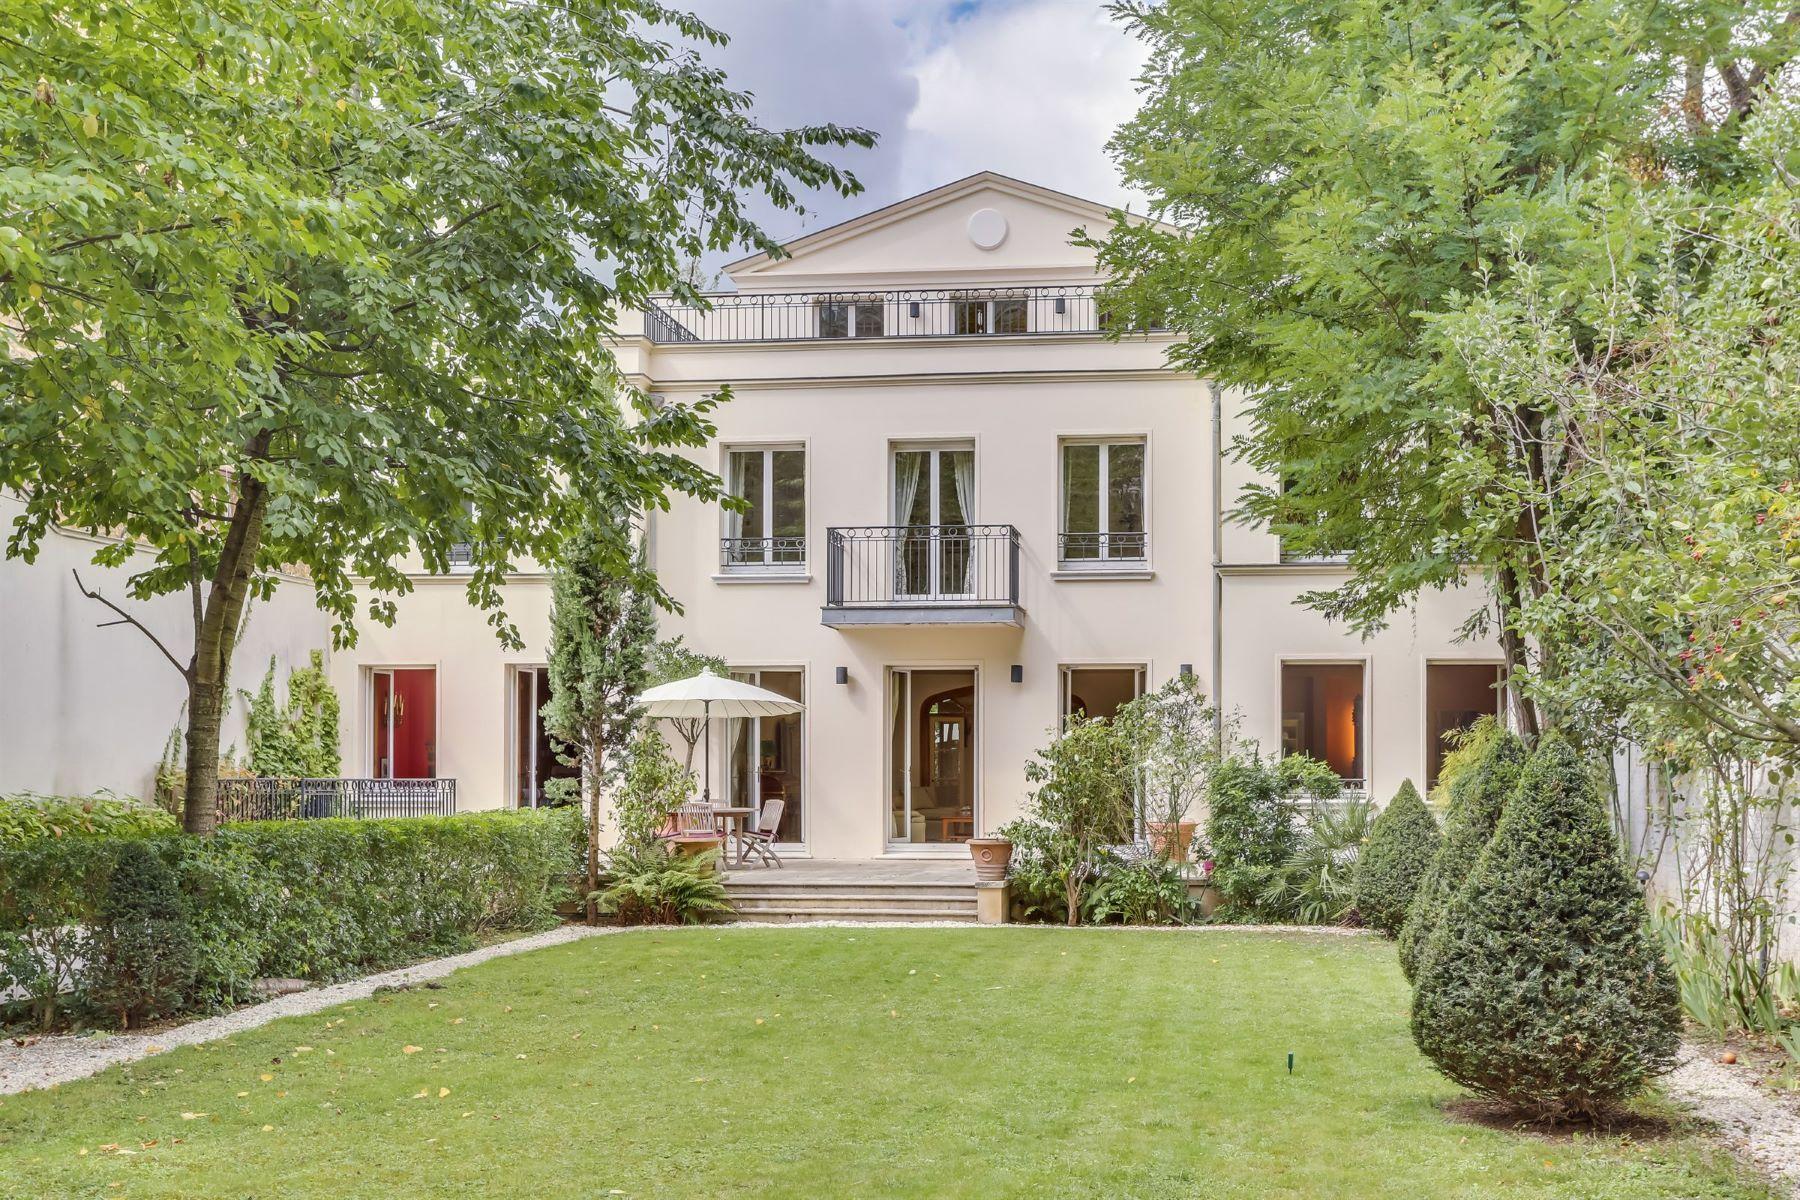 Single Family Home for Sale at Saint-James Neuilly Sur Seine, Ile-De-France 92200 France